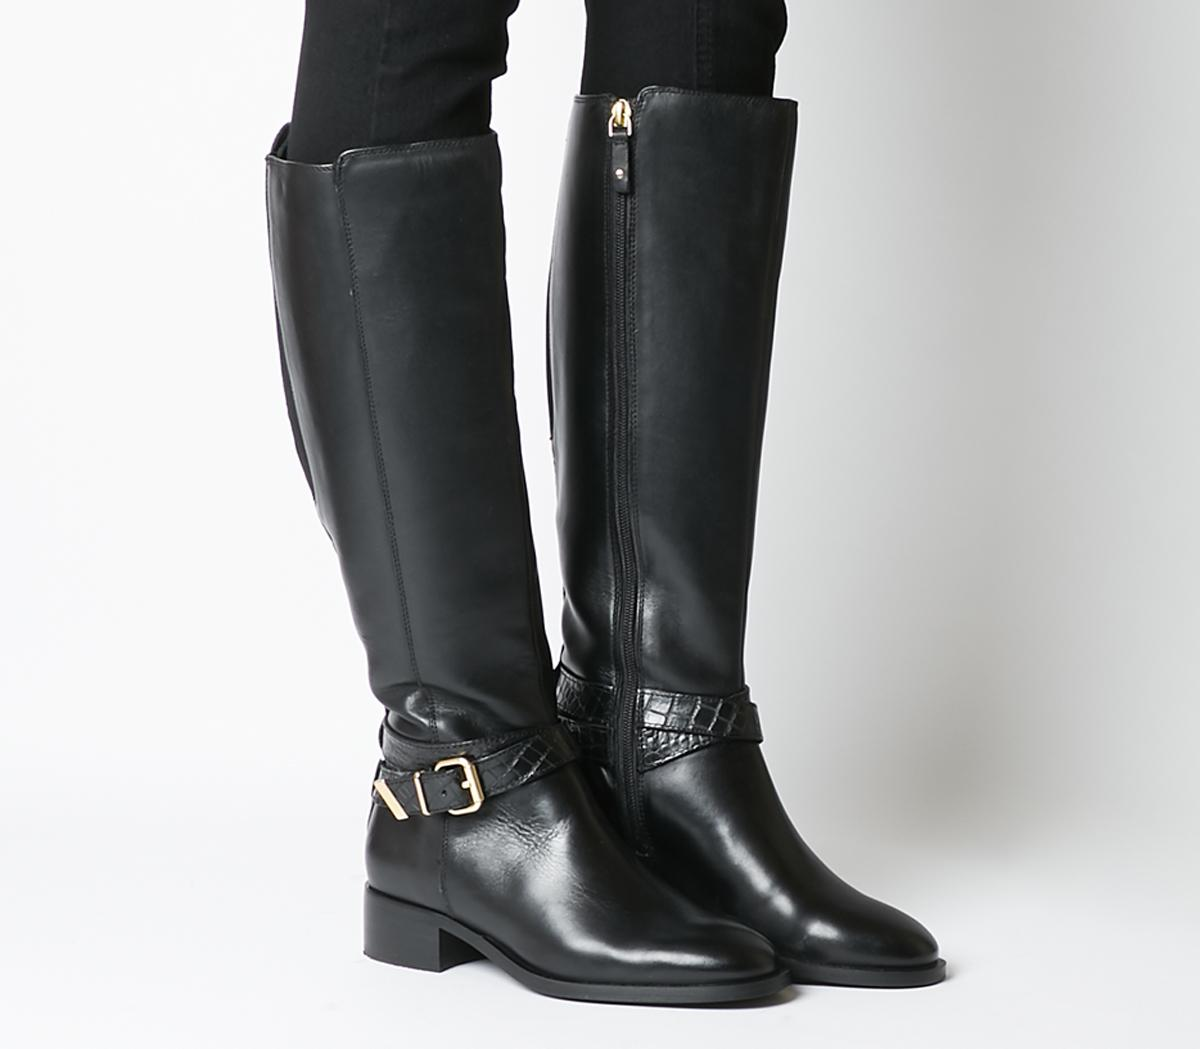 Karter Rider Knee Boots Black Leather